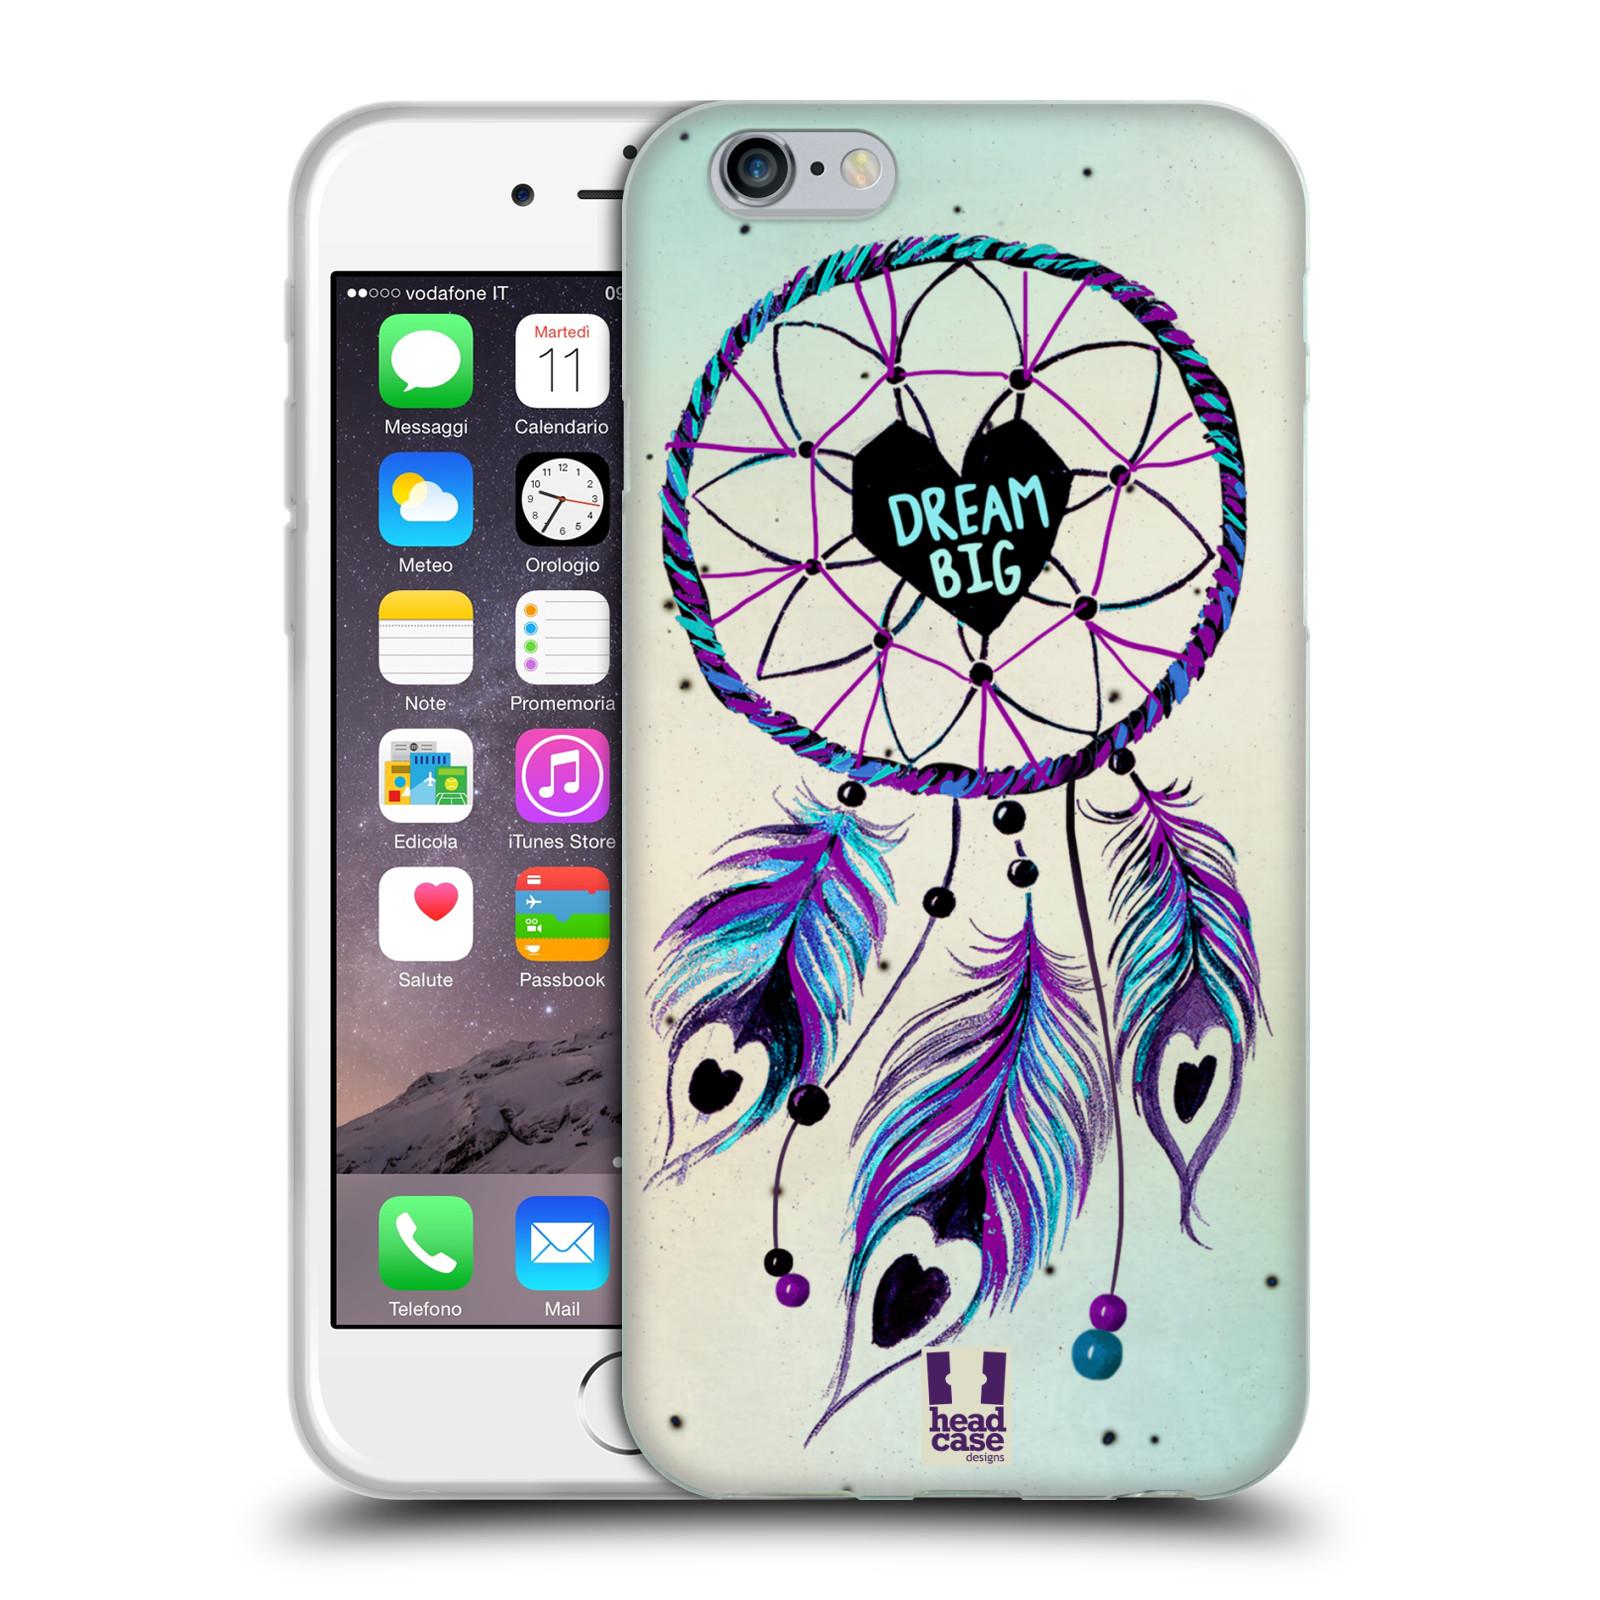 Silikonové pouzdro na mobil Apple iPhone 6 HEAD CASE Lapač Assorted Dream Big Srdce